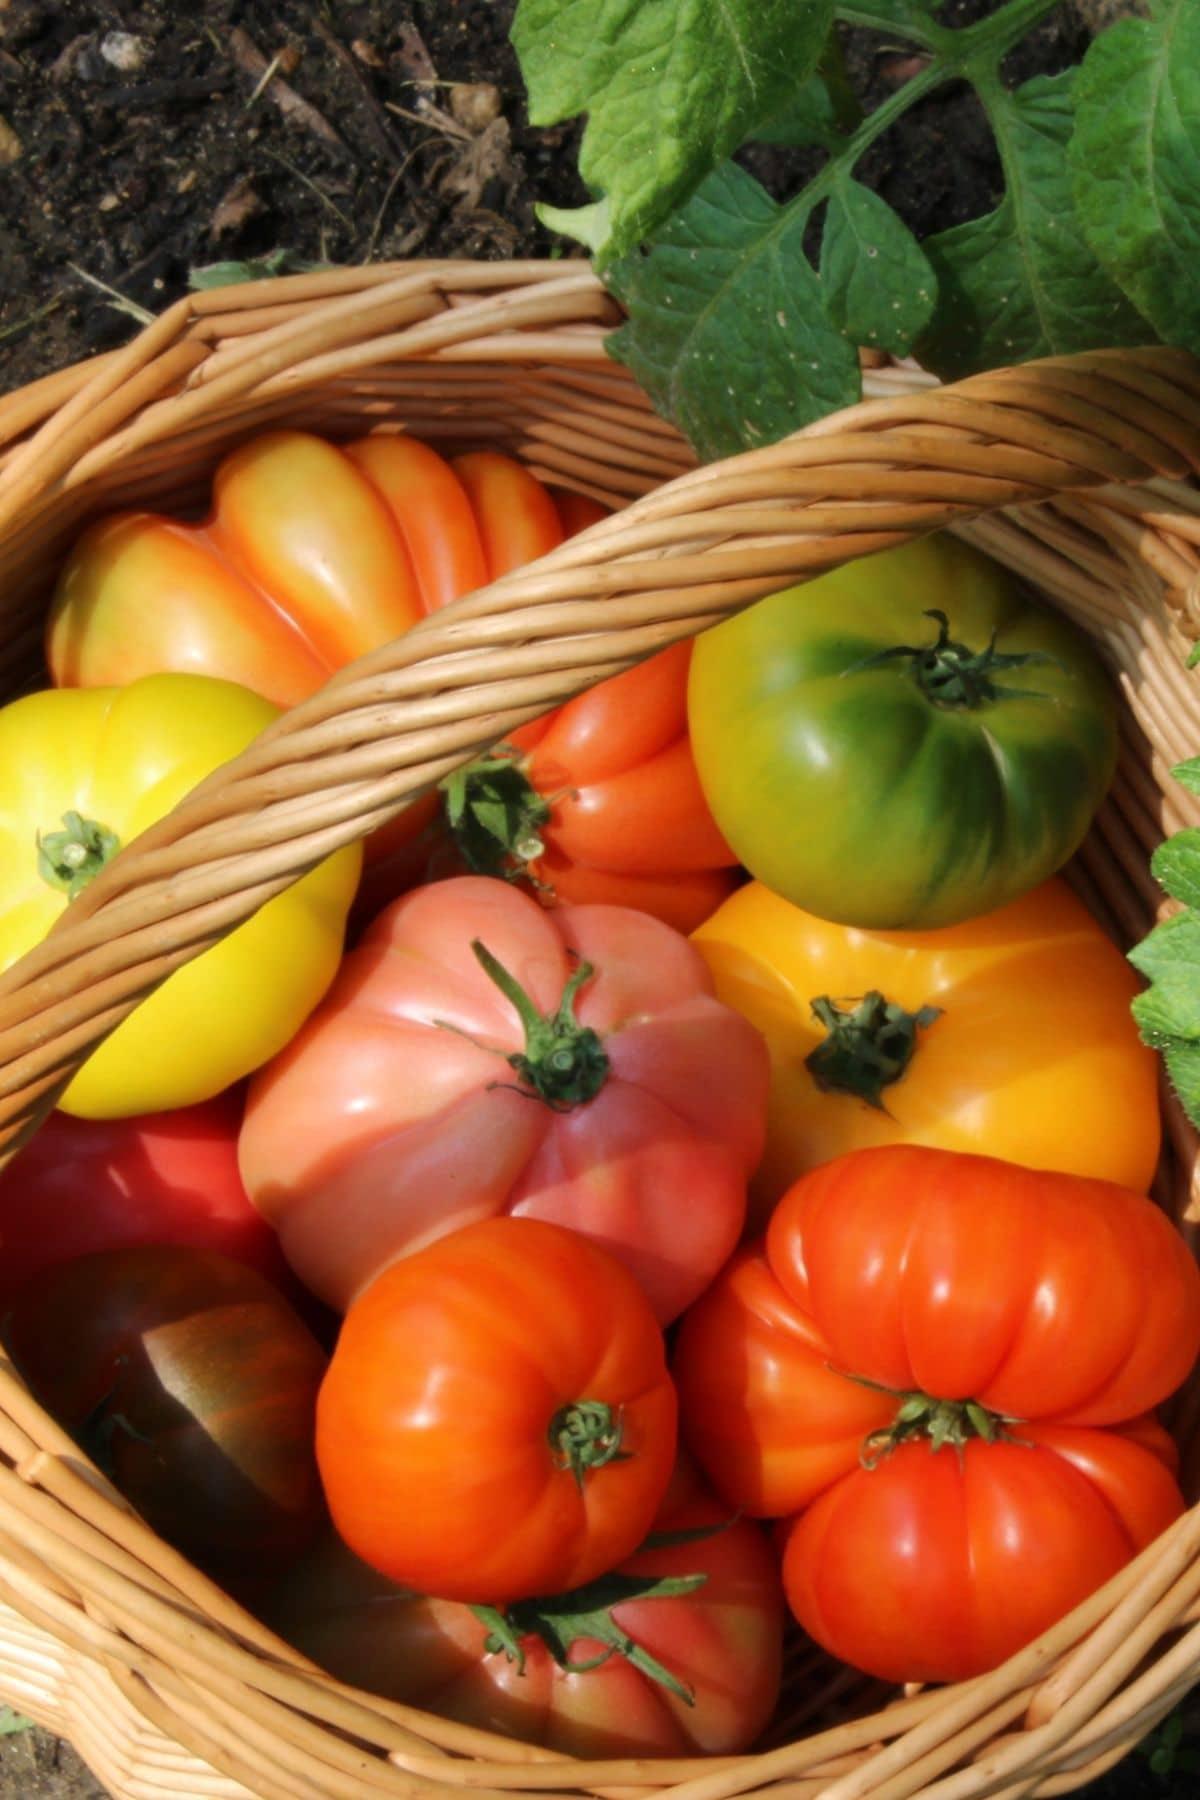 heirloom tomatoes in a basket.